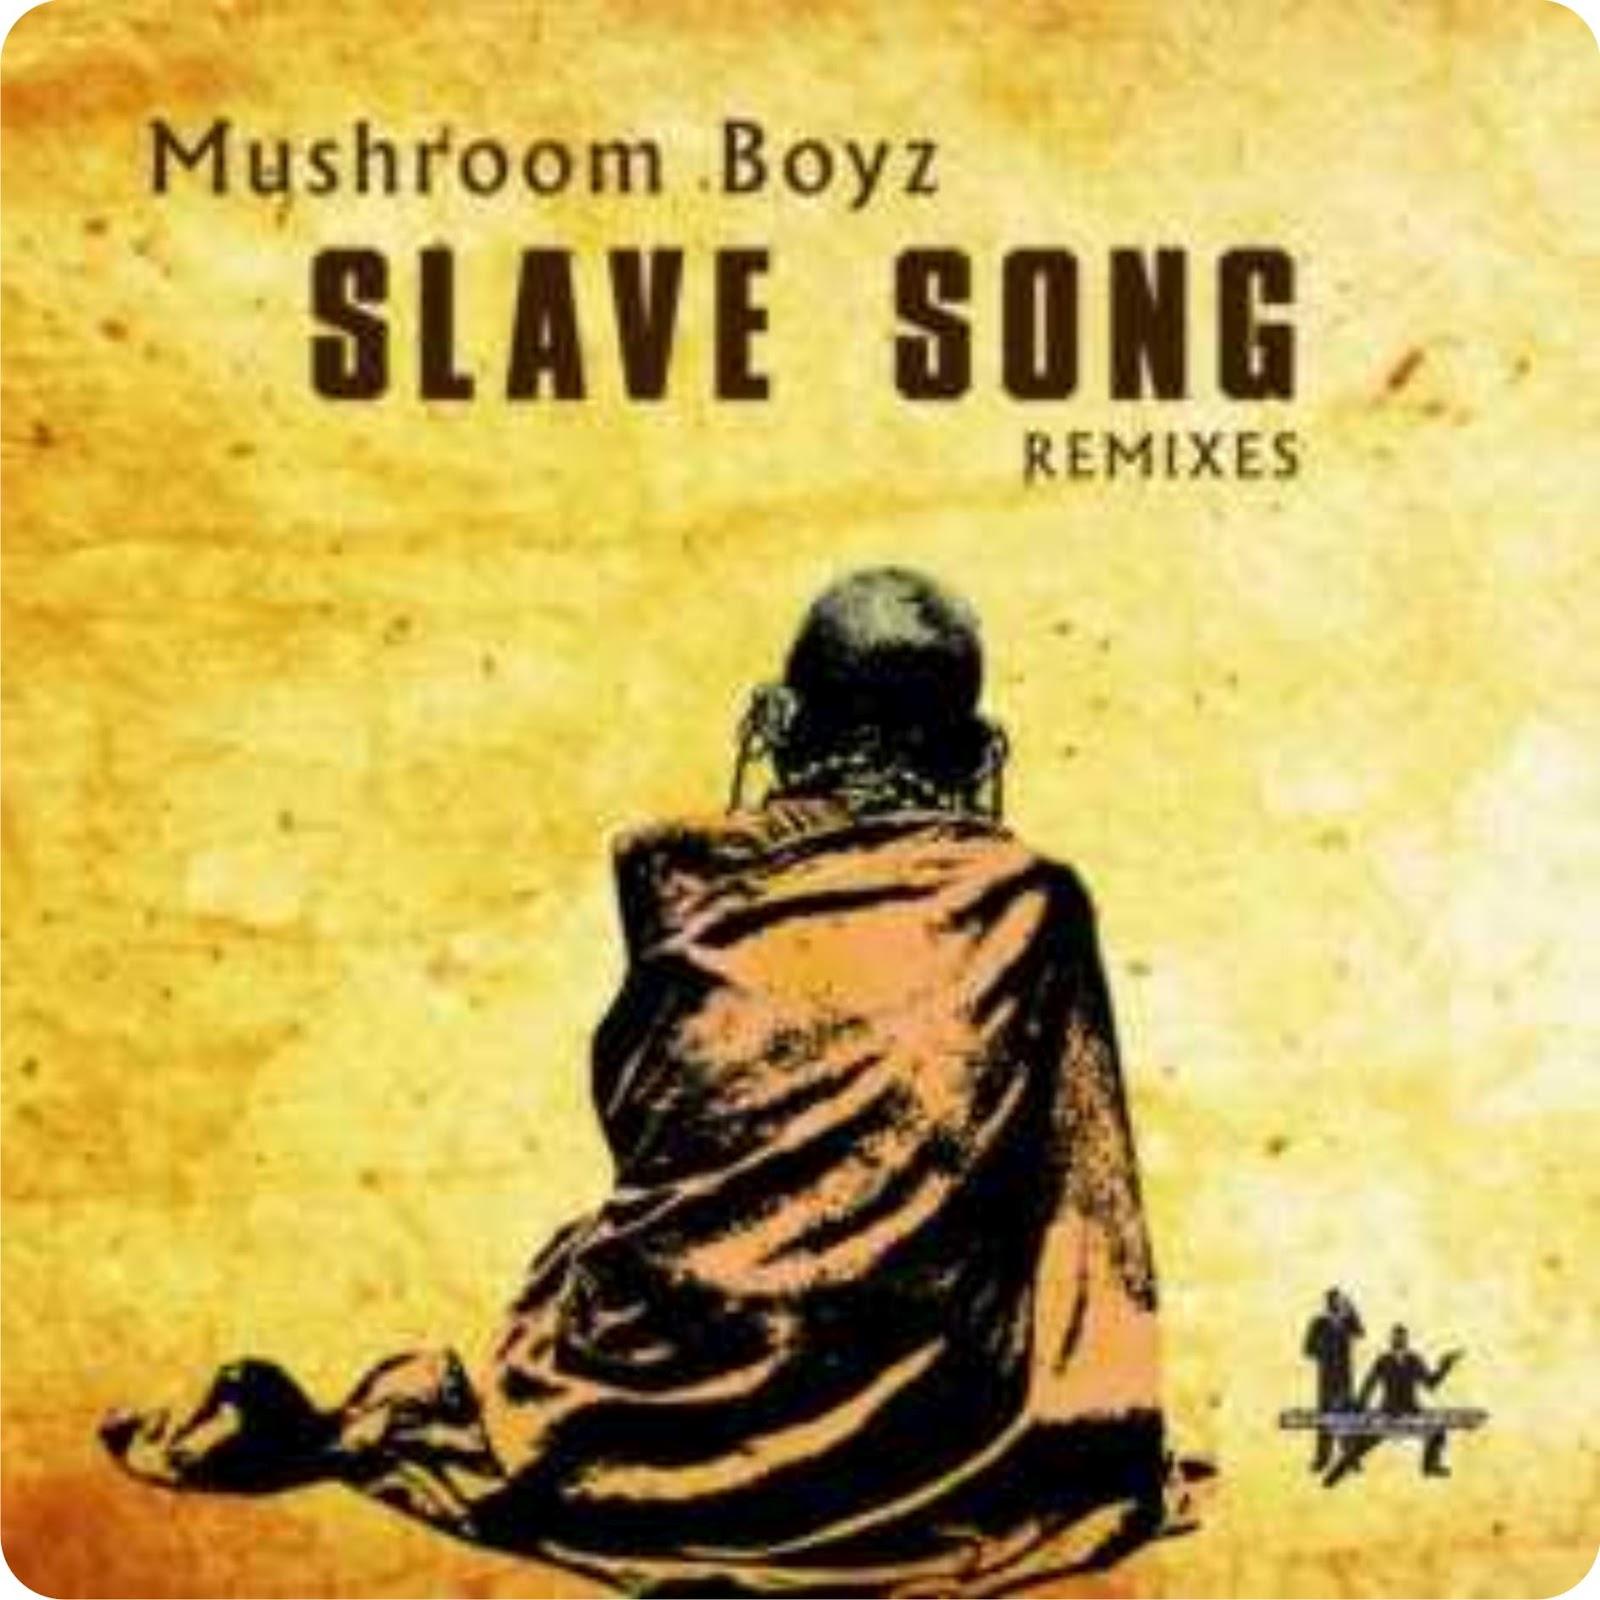 Mushroom boyz slave song darque 39 s tribute mix for 45 house music